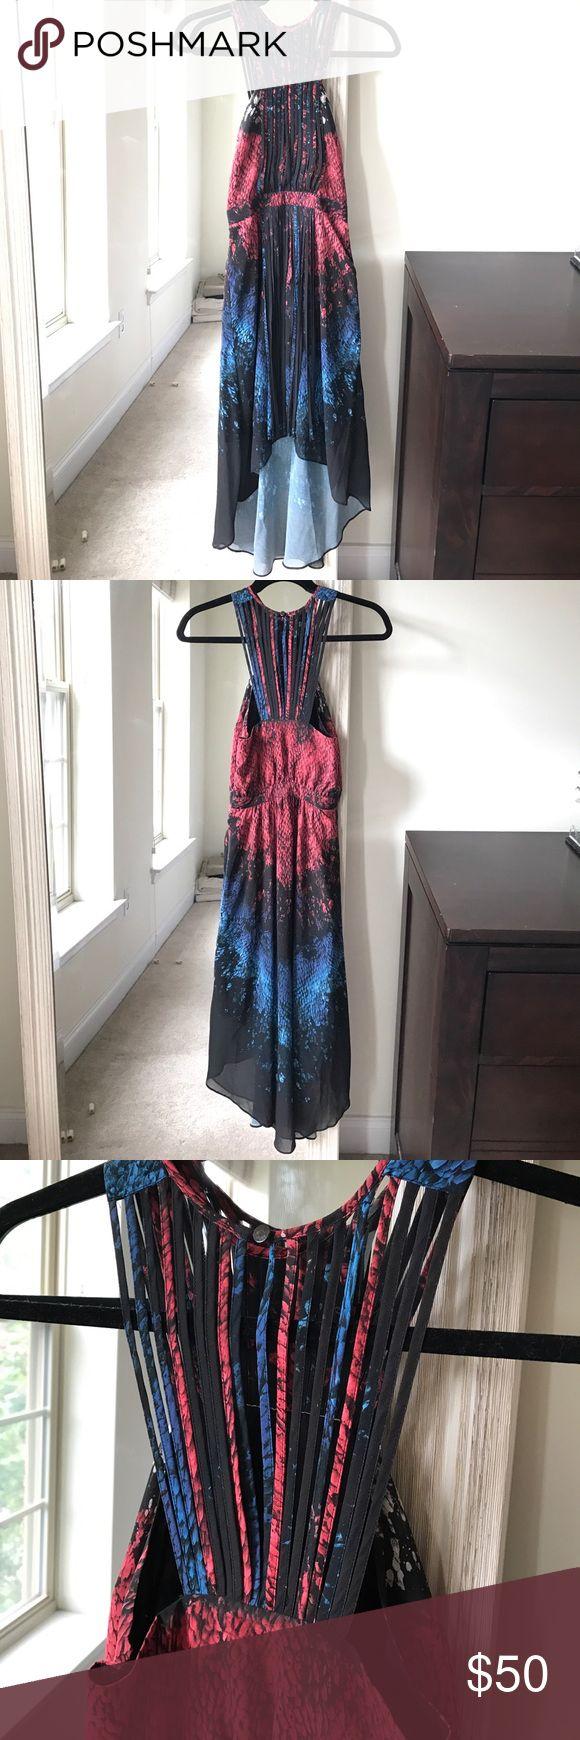 warehouse snakeskin print midi dress (UK 6/US 2)✨ warehouse snakeskin print midi dress. Red, blue, and black. Fringe down front. High low hem. Purchased from ASOS.  (UK 6/US 2)✨ Asos Dresses High Low